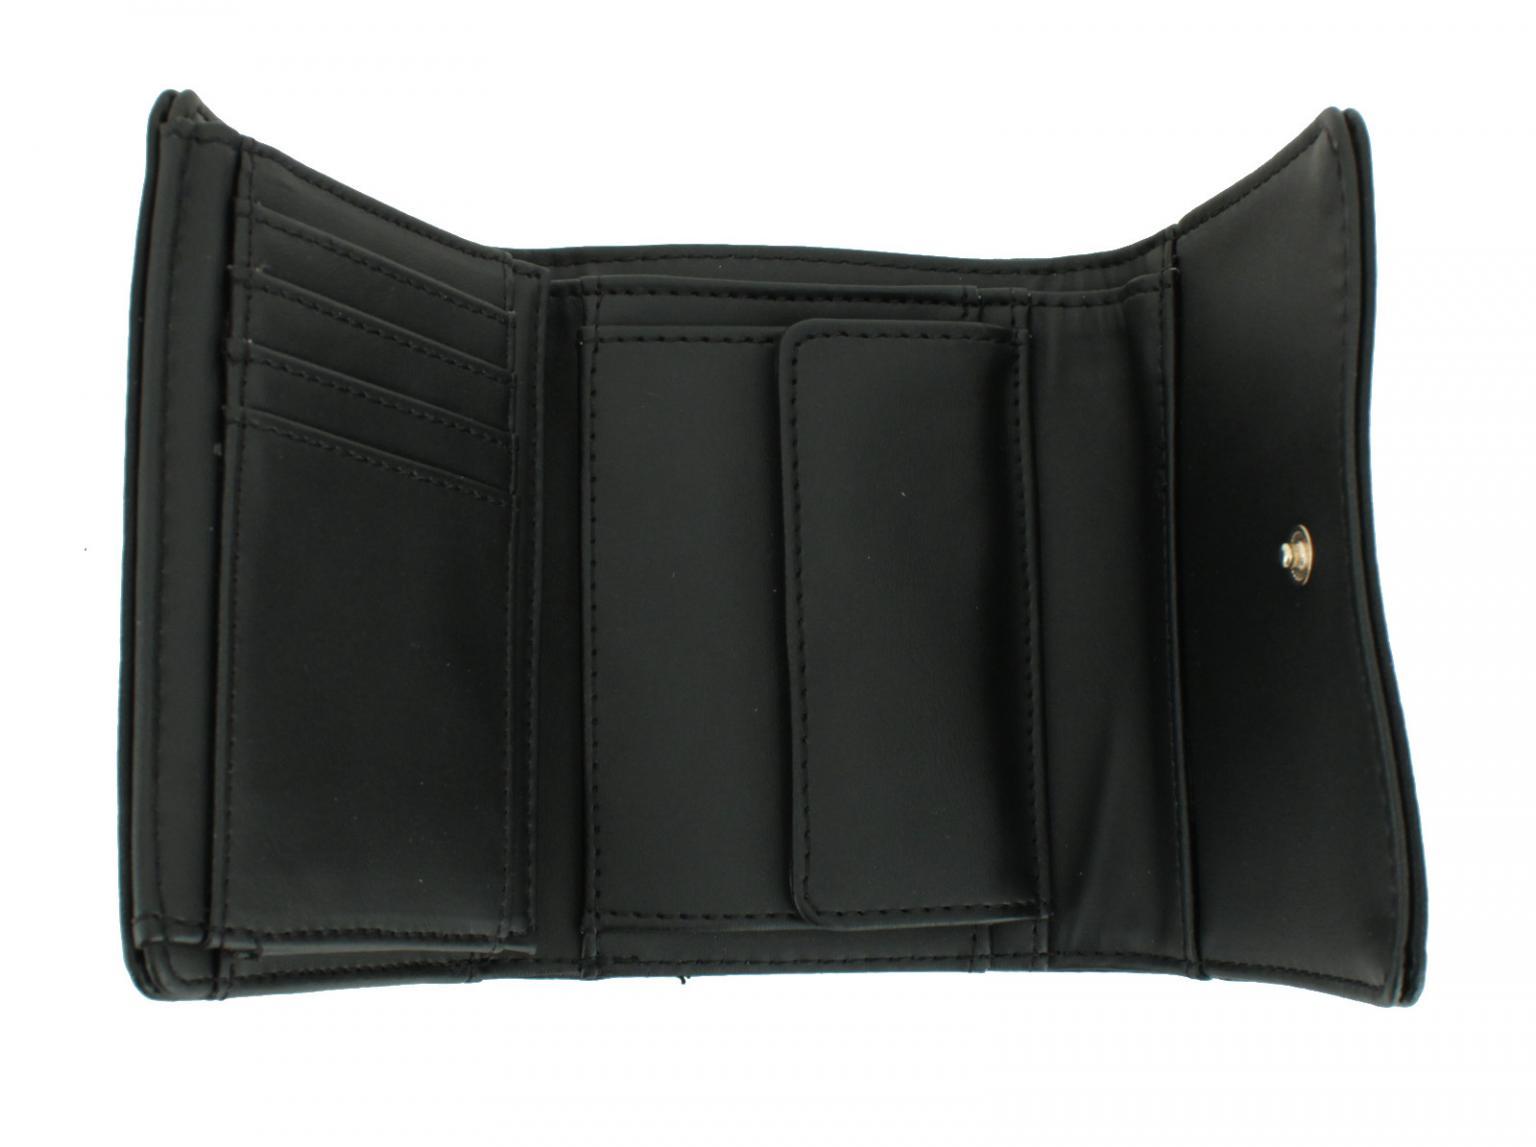 Damenportmonee Guess Dixie Black schwarz Nieten Metallring